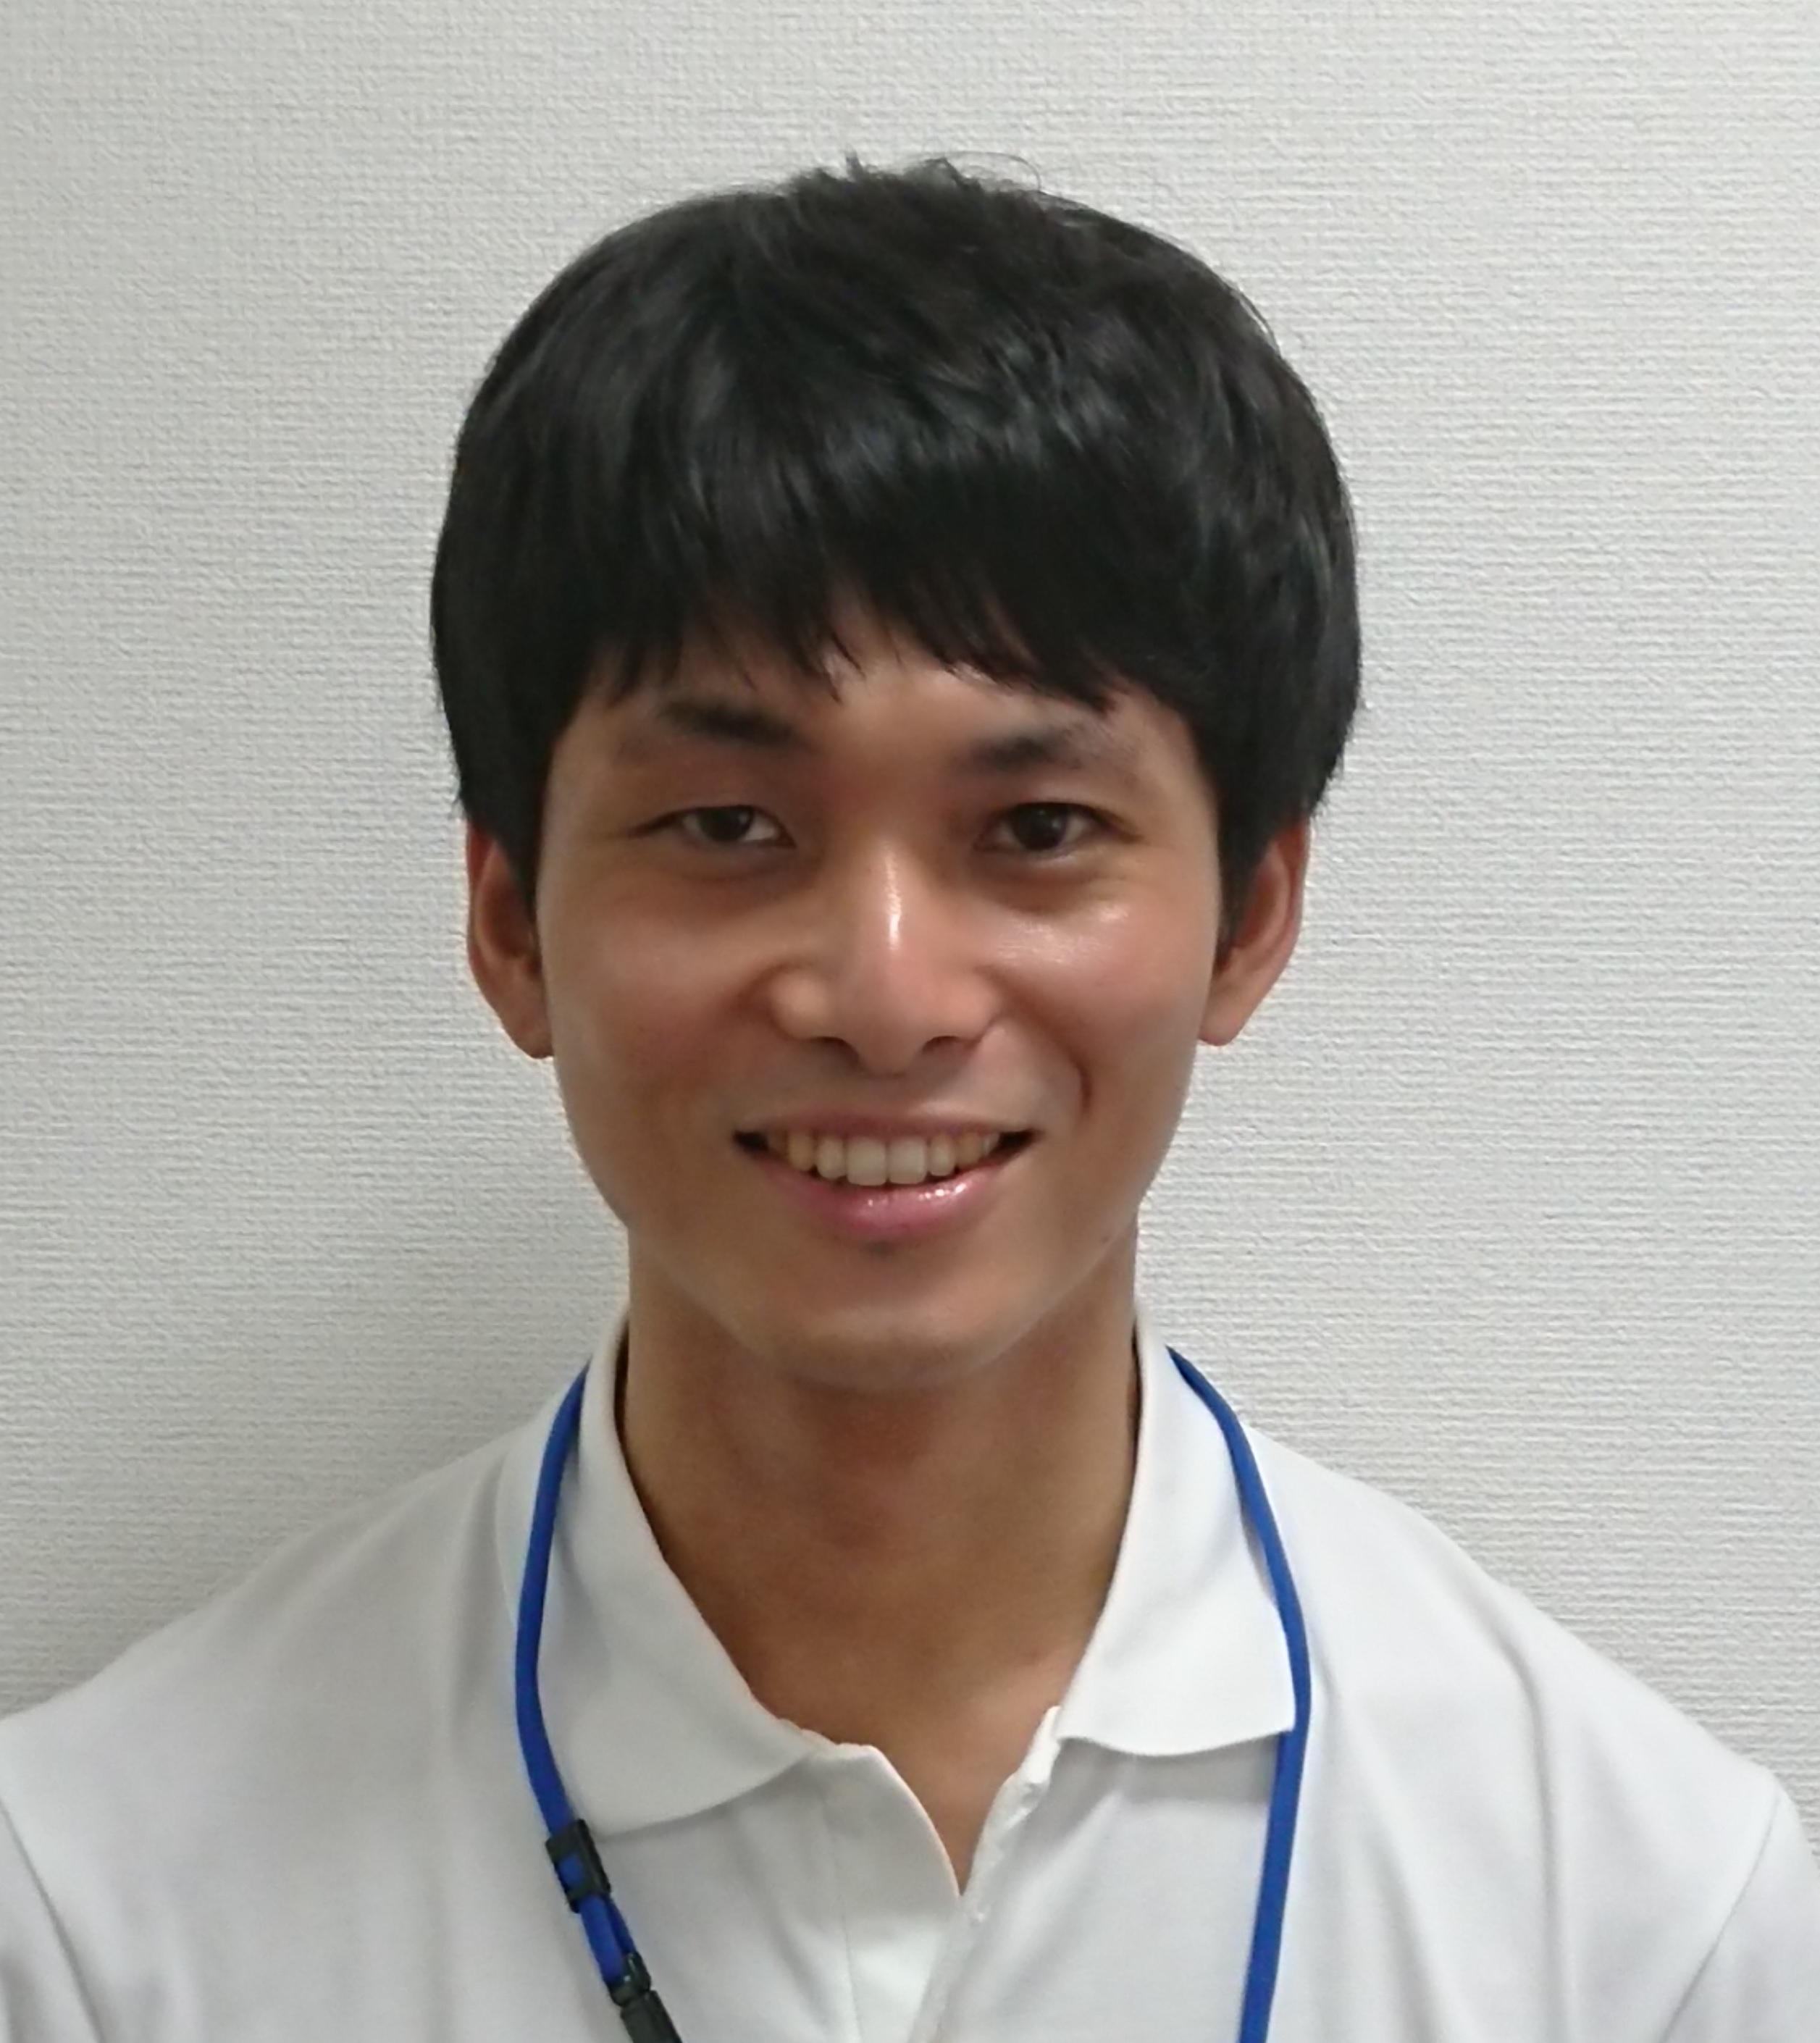 Wataru Kurihara